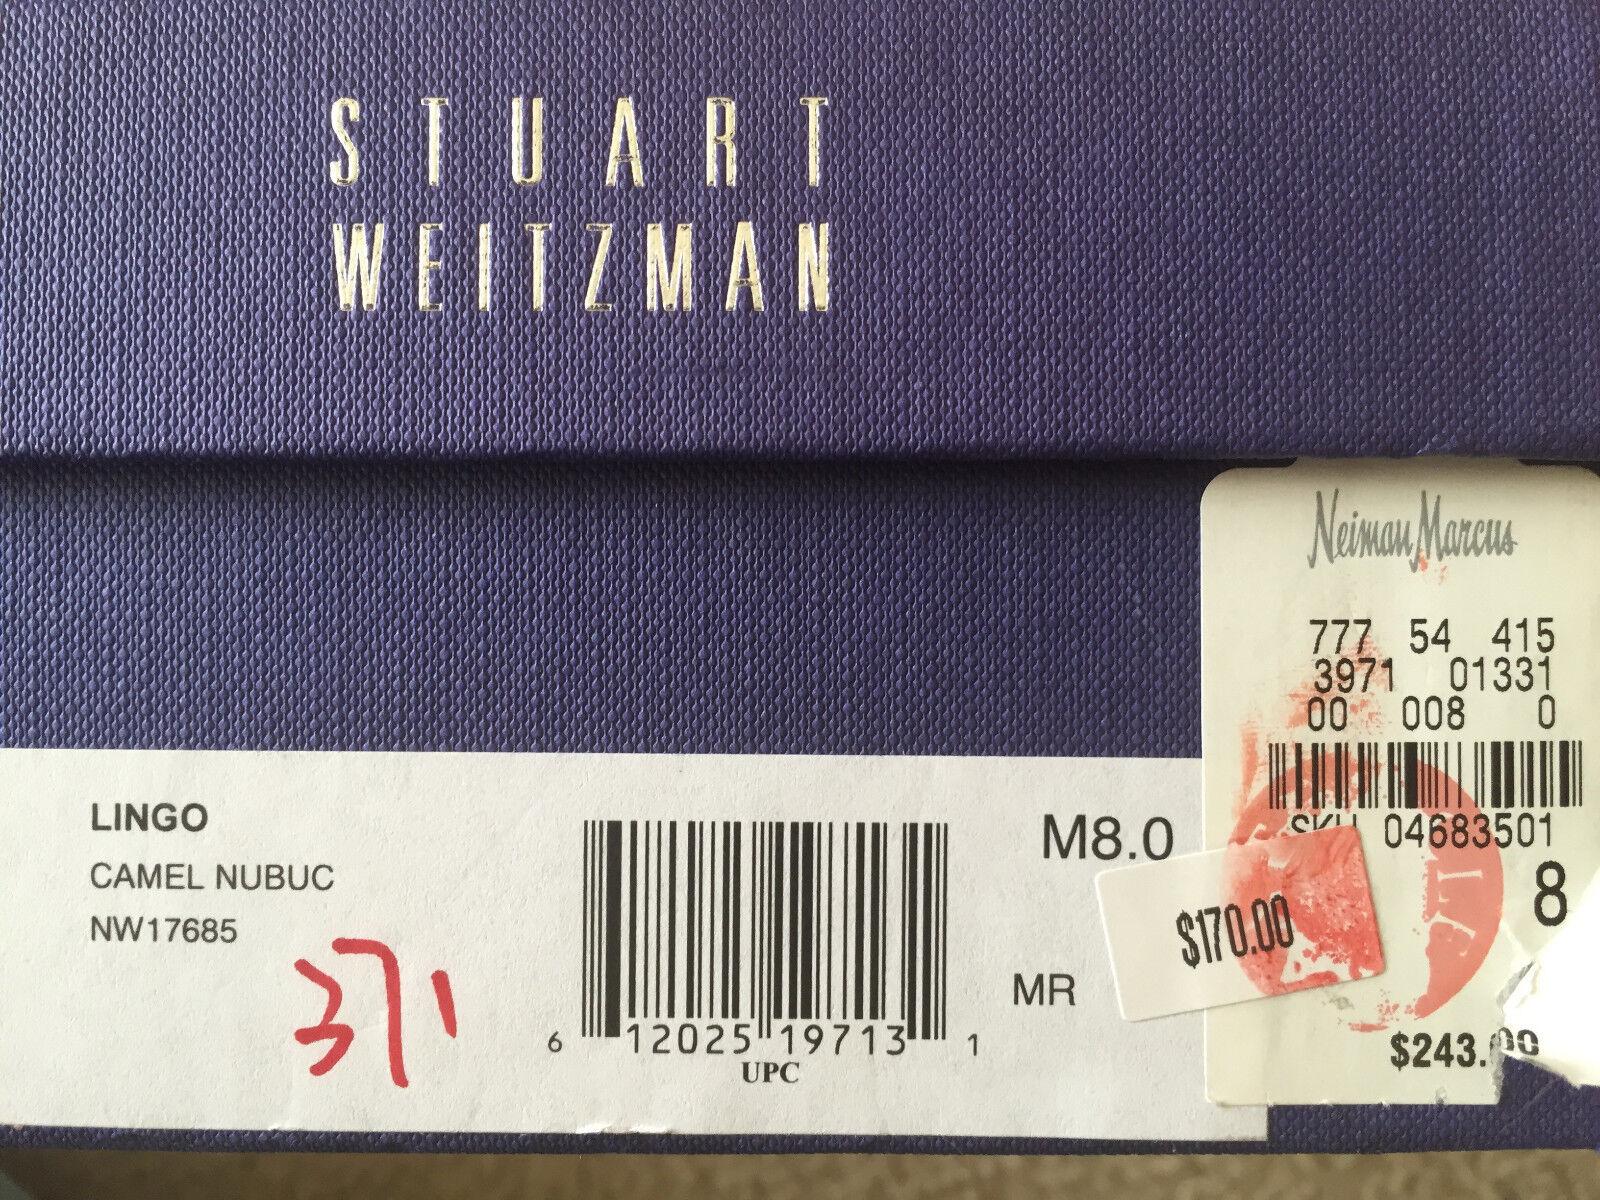 Nuevo En Lingo Caja Stuart Weitzman Lingo En Nubuck fumar Mocasín 5.5 6 6.5 7 7.5 8 8.5 Stud 6b0a4c